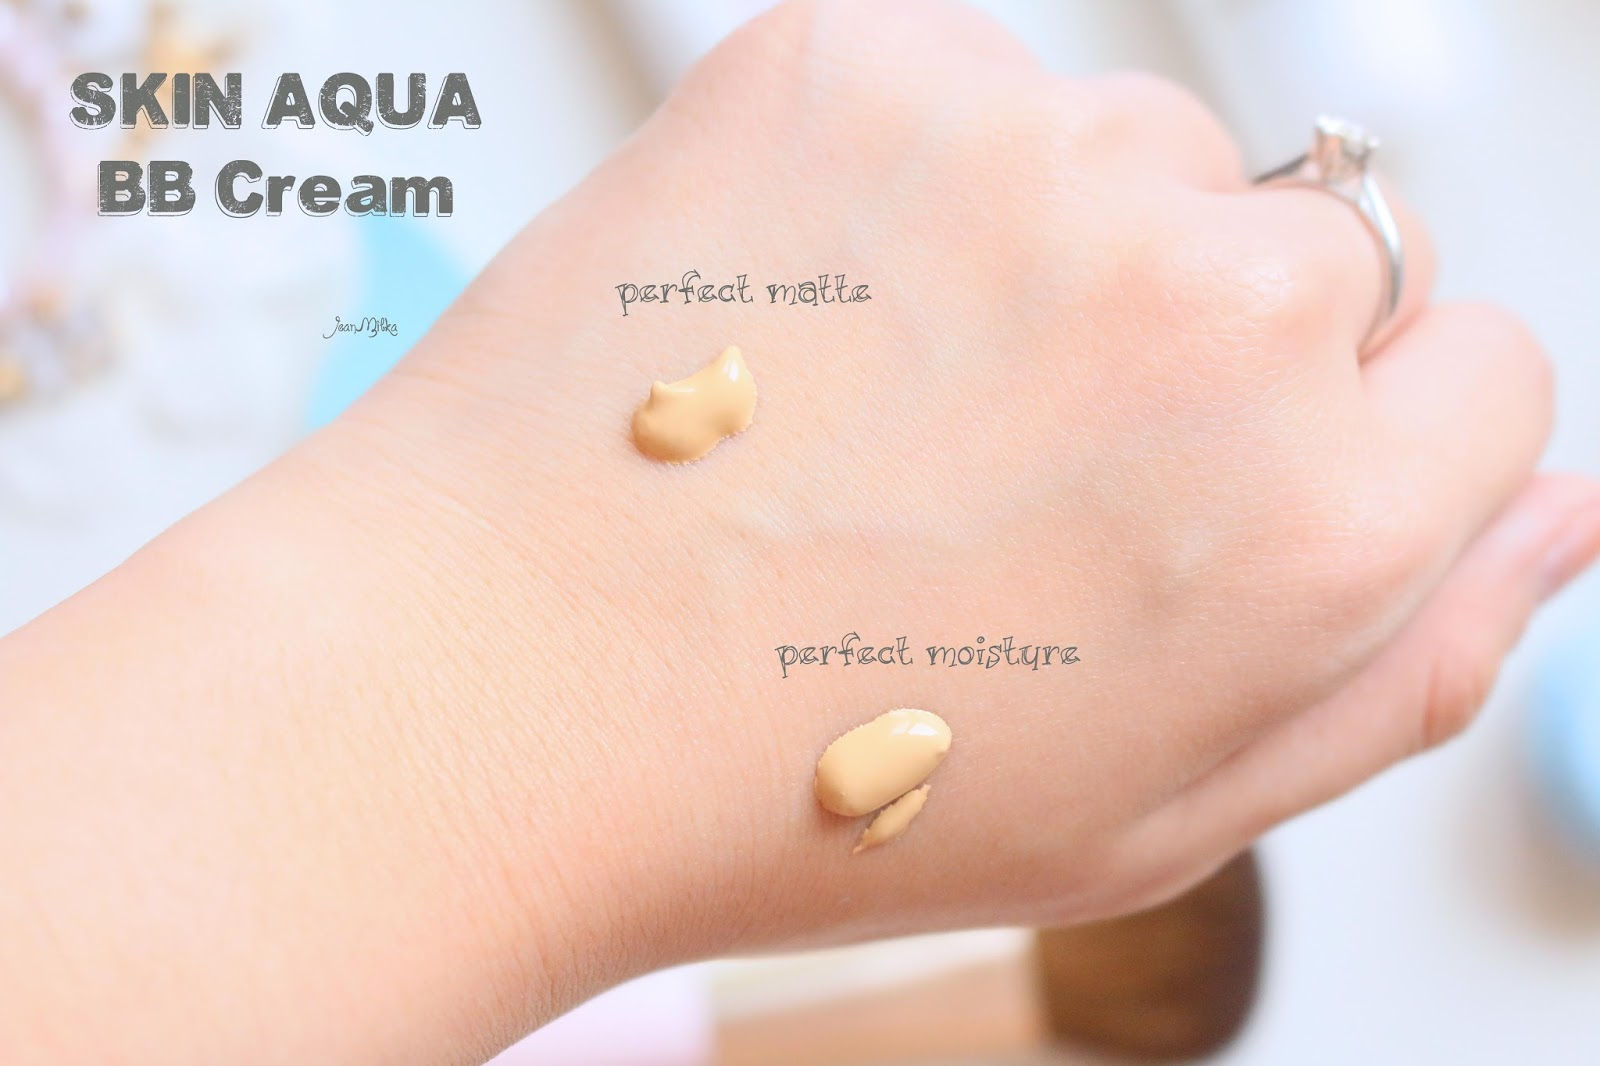 skin aqua, bb cream, makeup, review, japan, everyday, perfect matte, perfect moisture, swatch